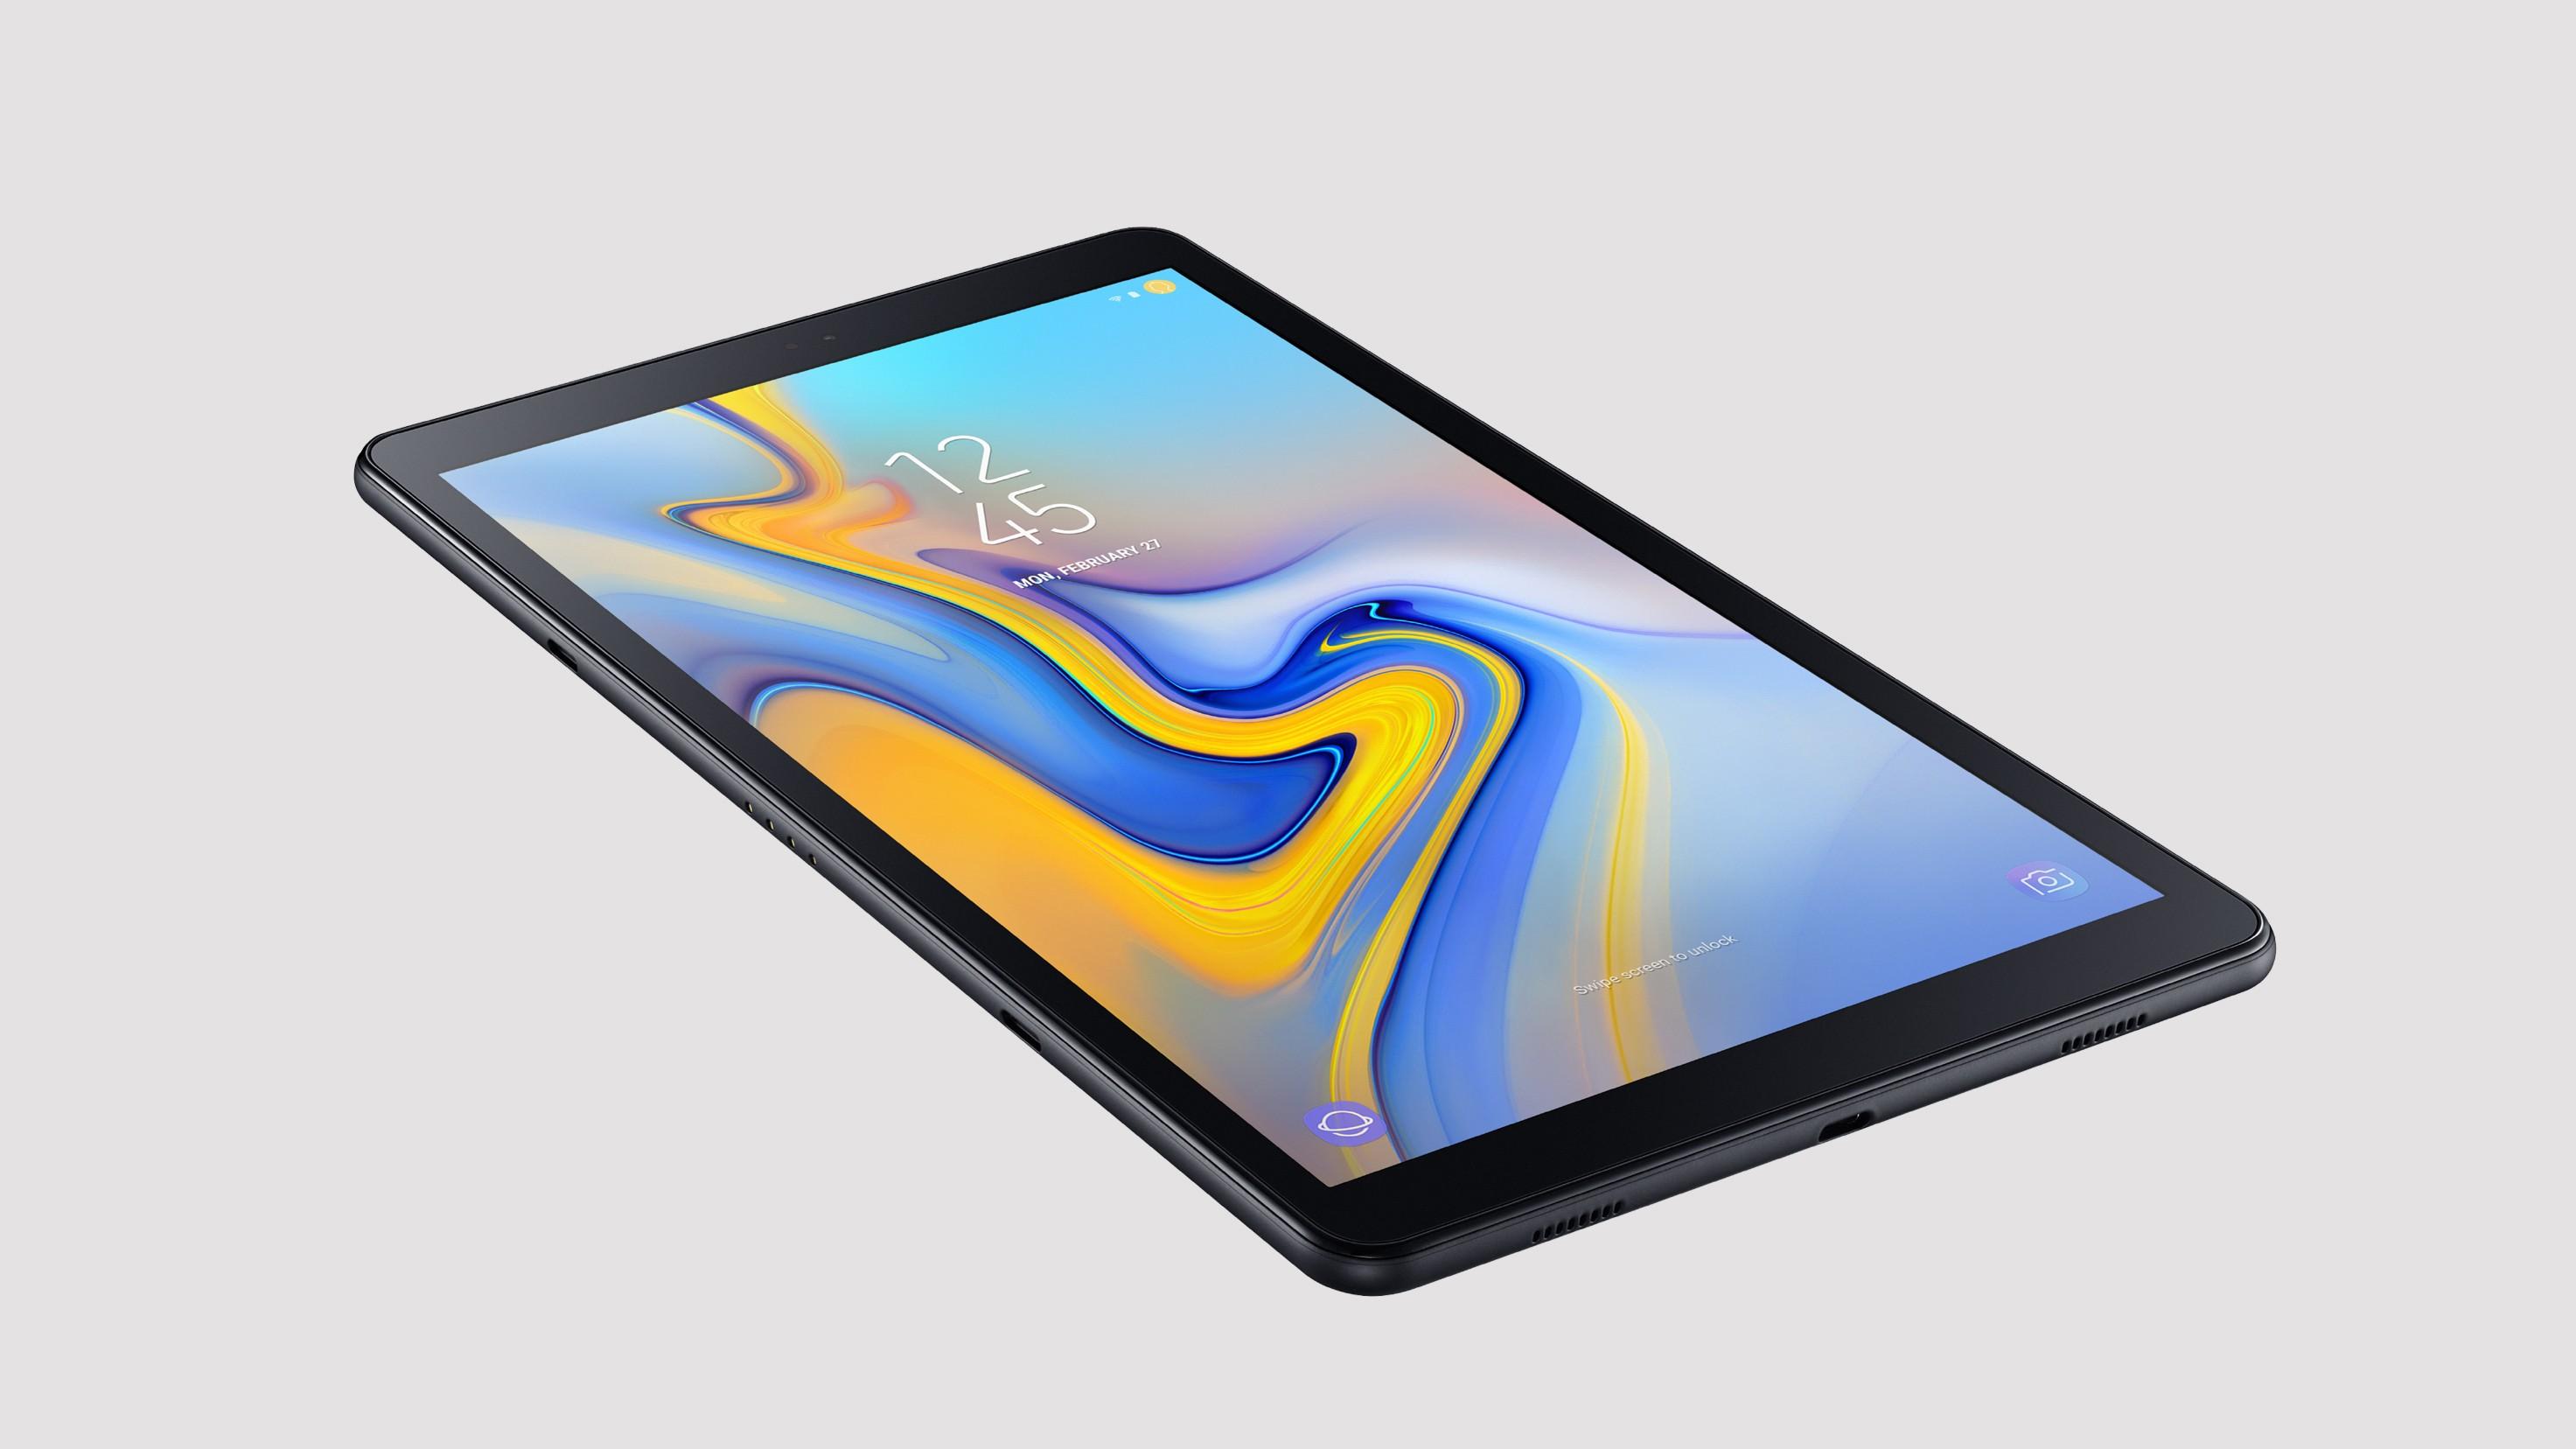 Galaxy Tab A 10,5 официально анонсирован